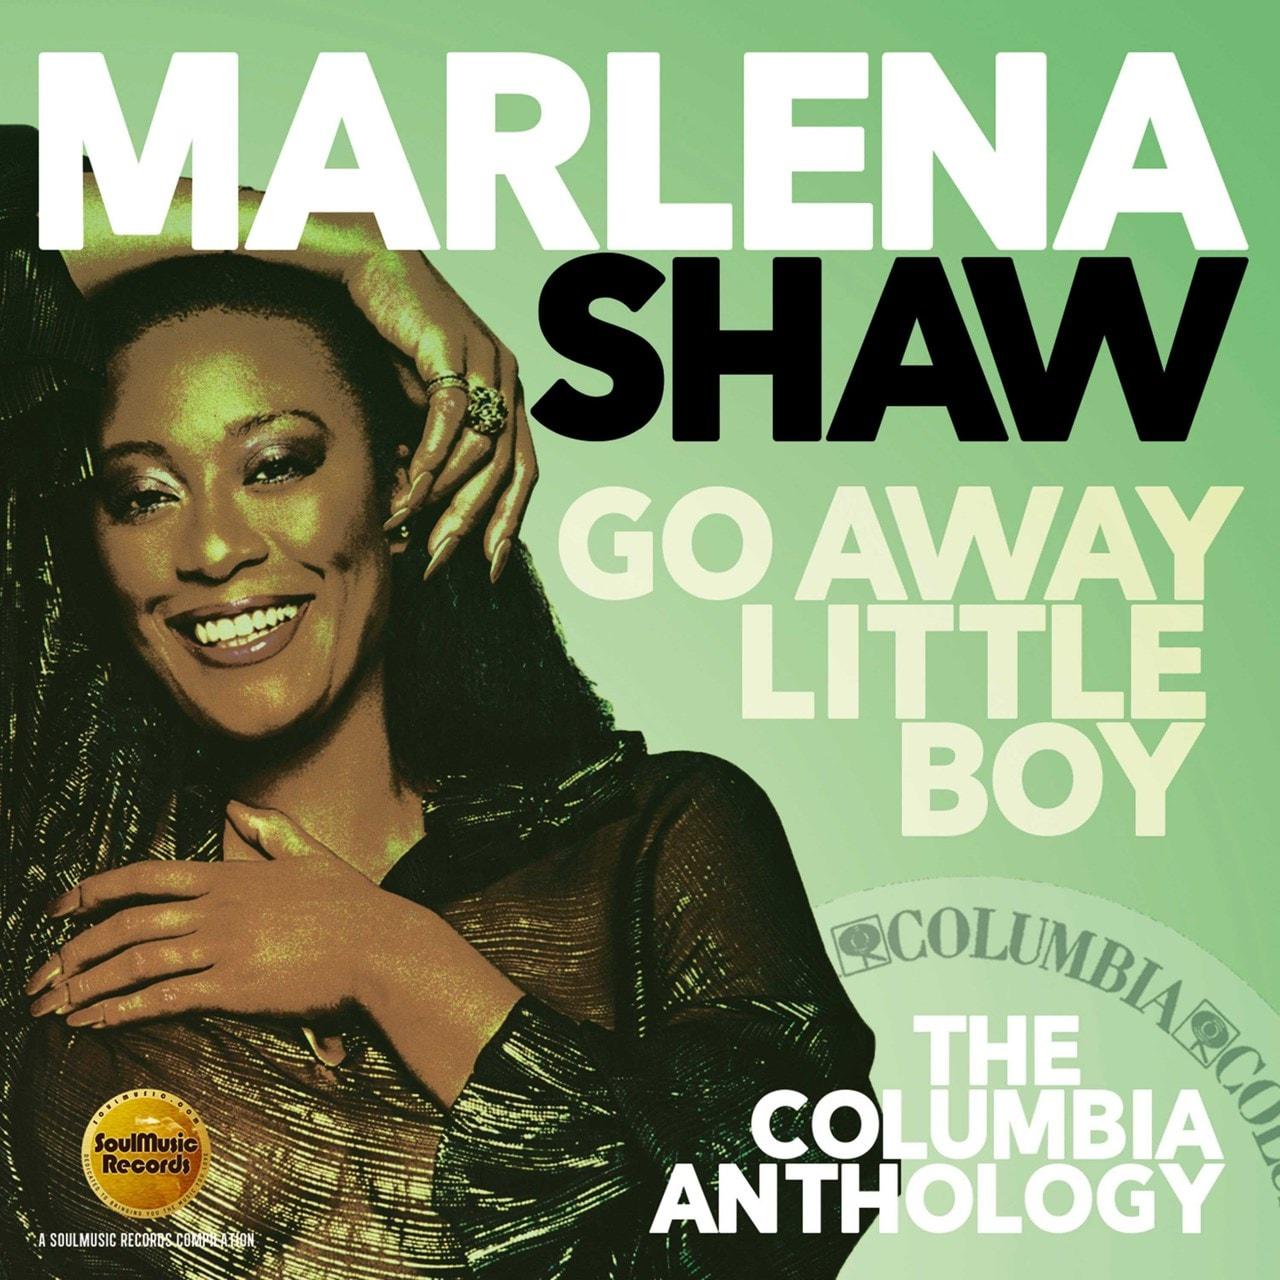 Go Away Little Boy: The Columbia Anthology - 1